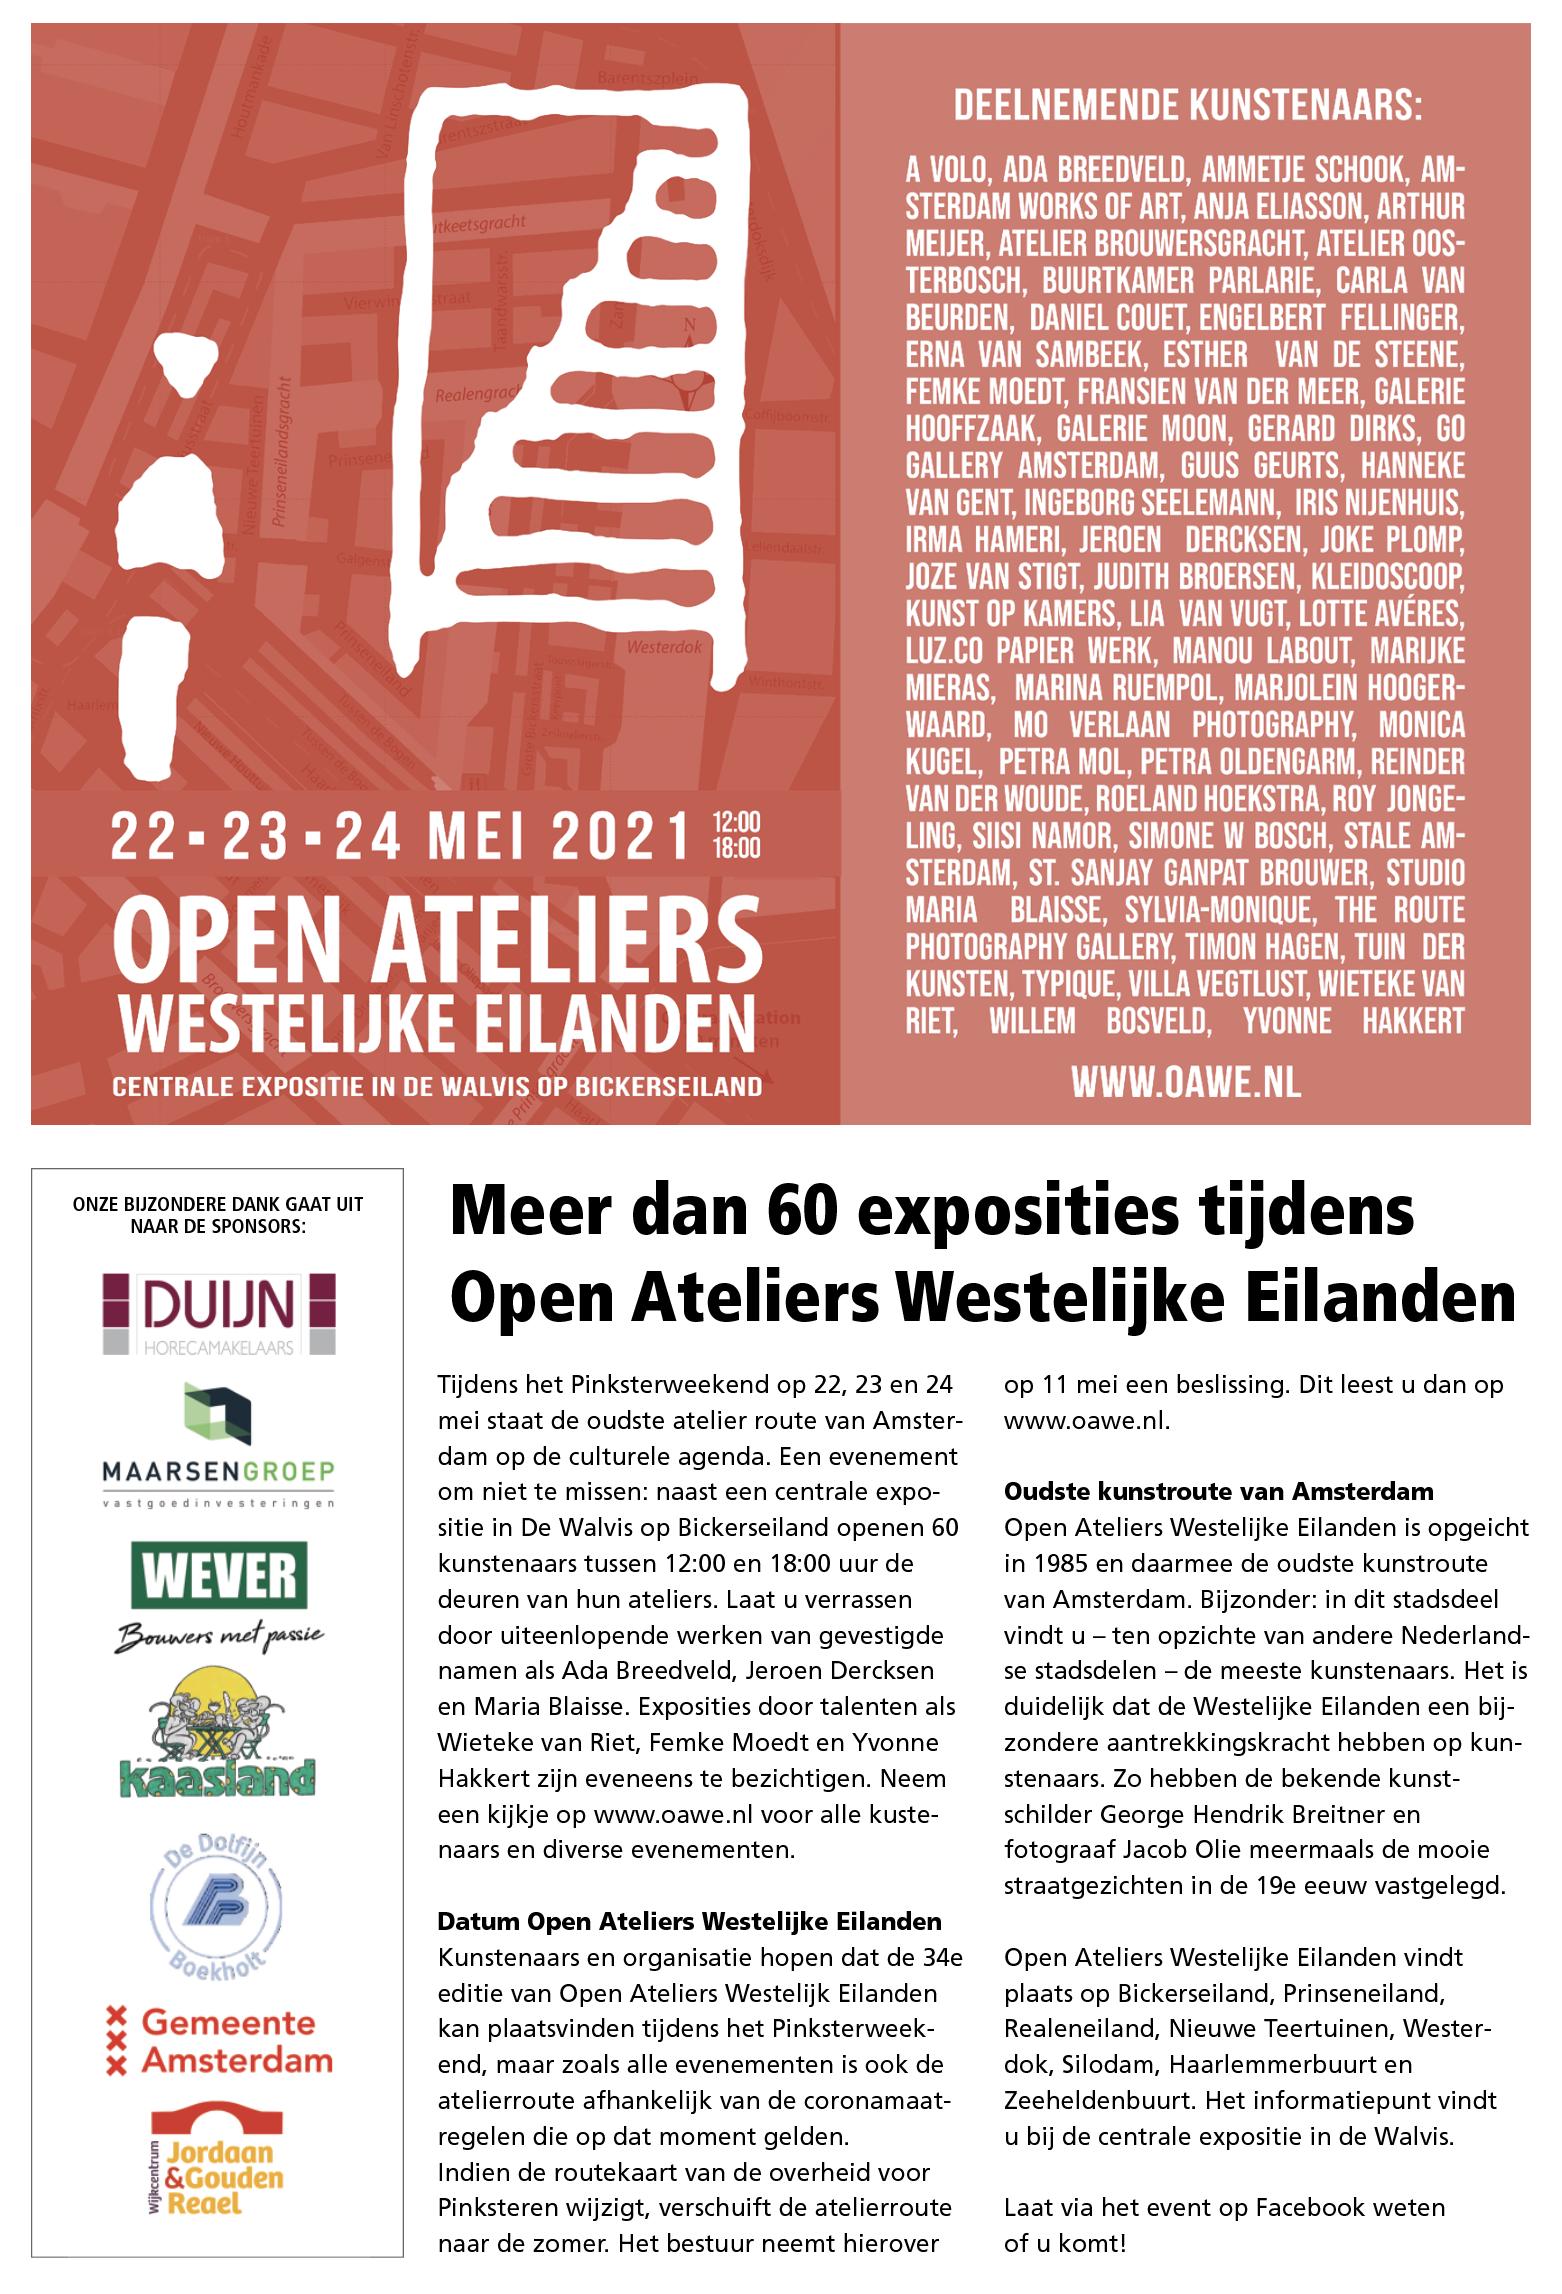 Wijkkrant Jordaan & Gouden Reael OAWE april 2021